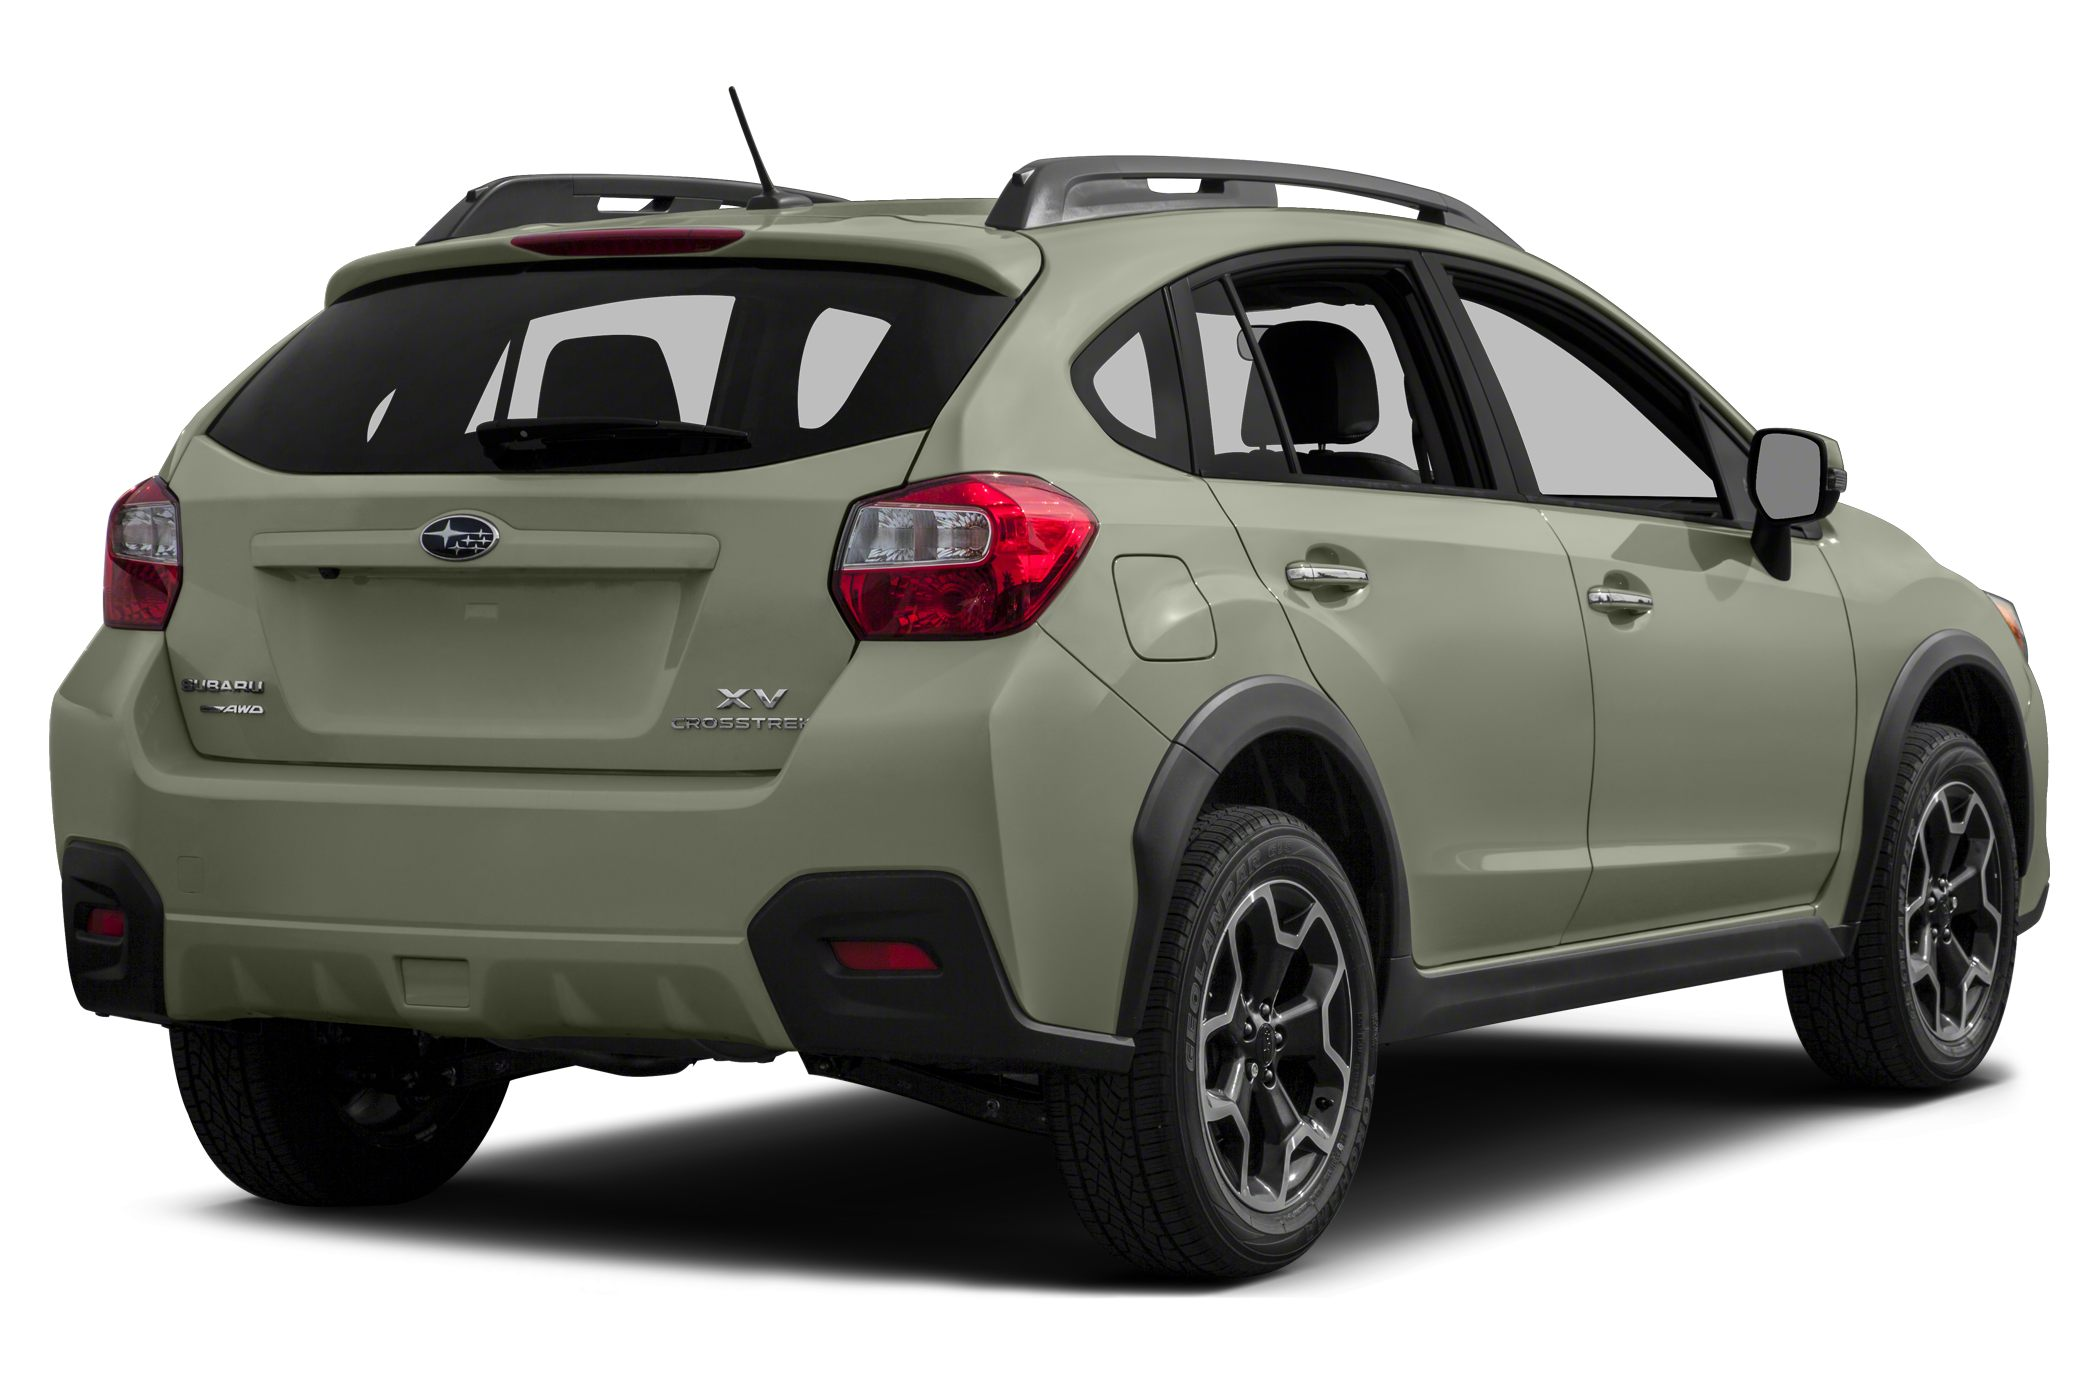 Car Deals Direct >> 2014 Subaru XV Crosstrek Pictures & Photos - CarsDirect